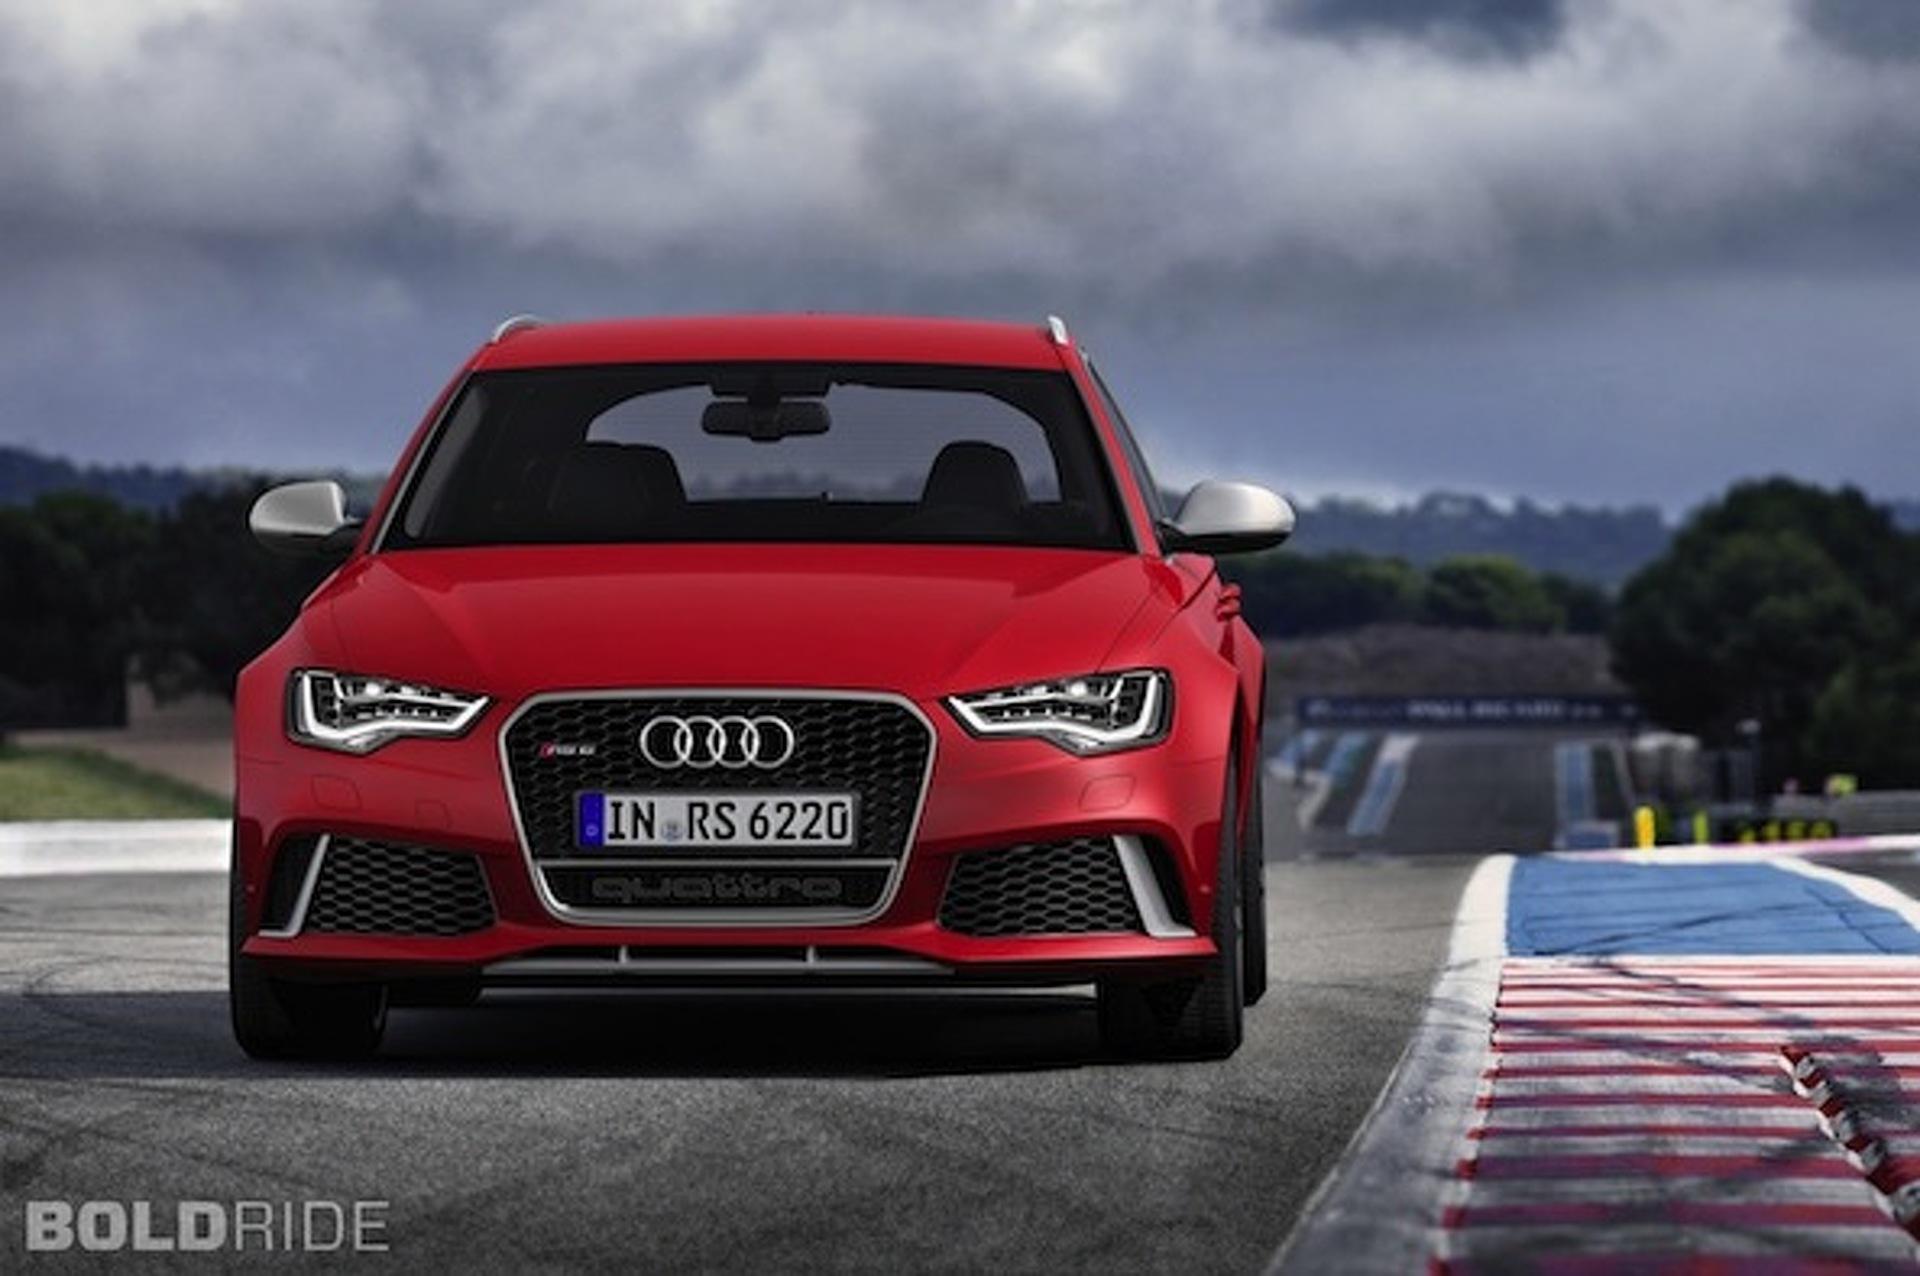 2014 Audi RS6 Avant: GIMME! GIMME! GIMME!